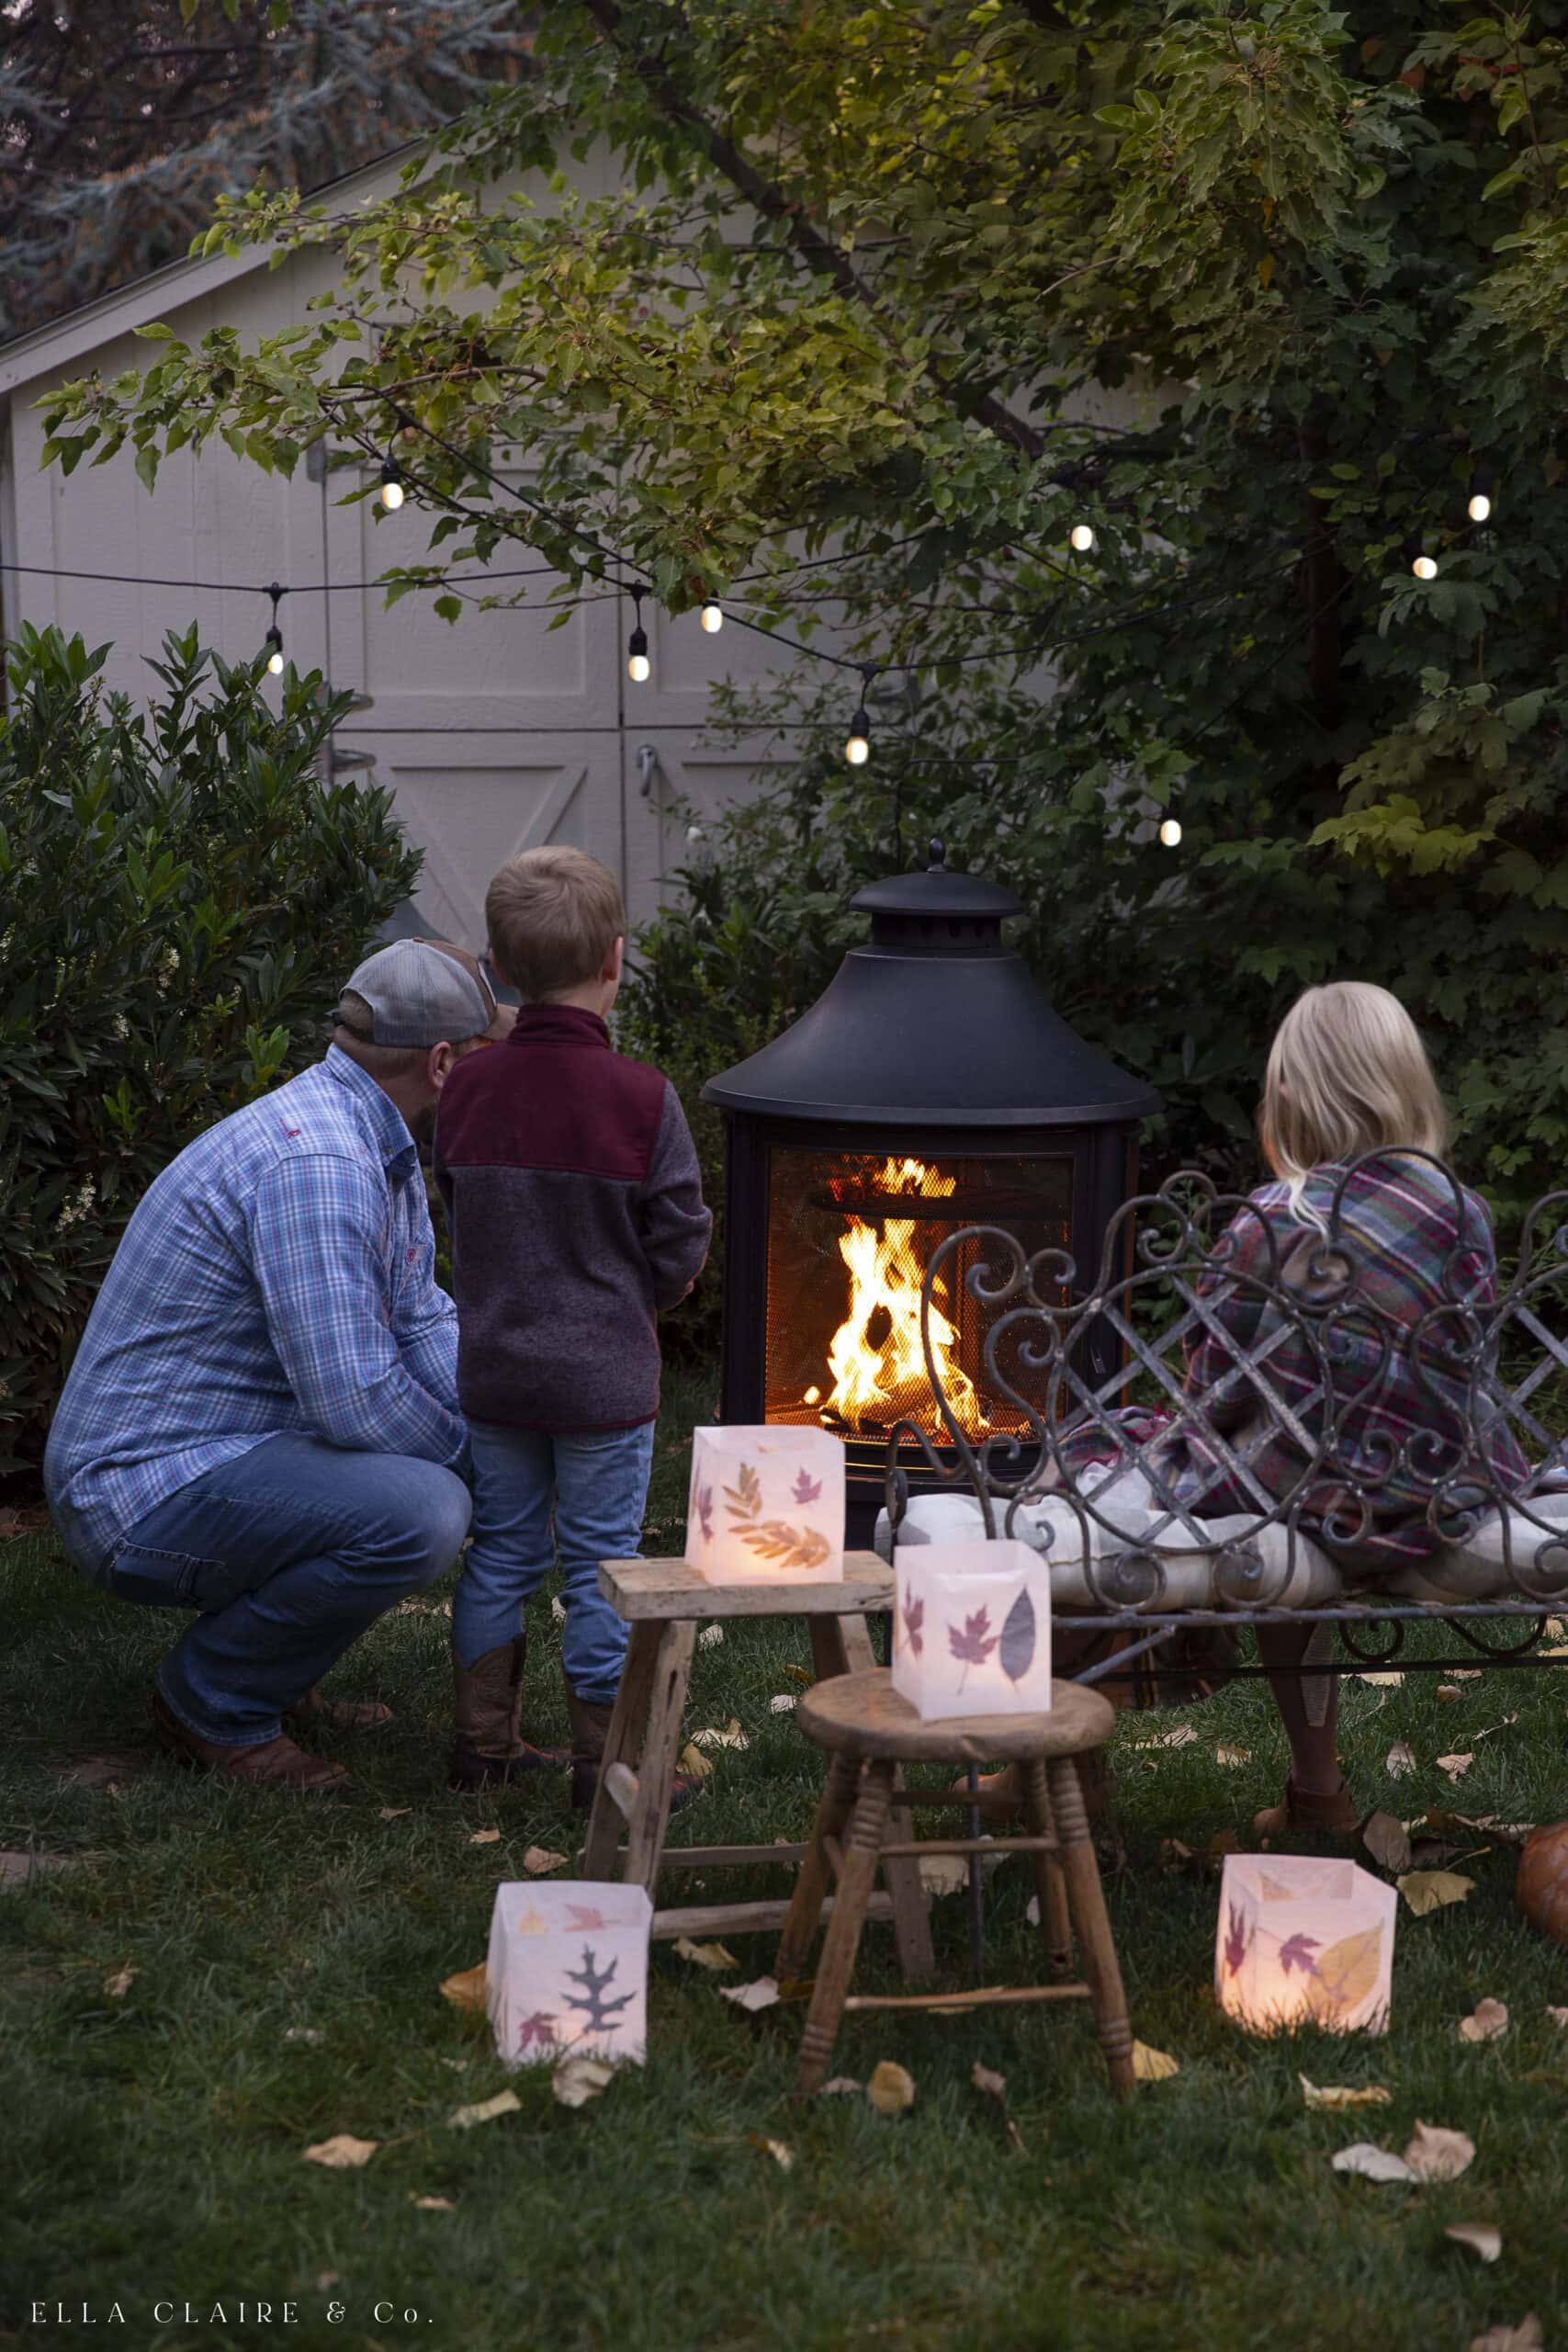 family around backyard campfire